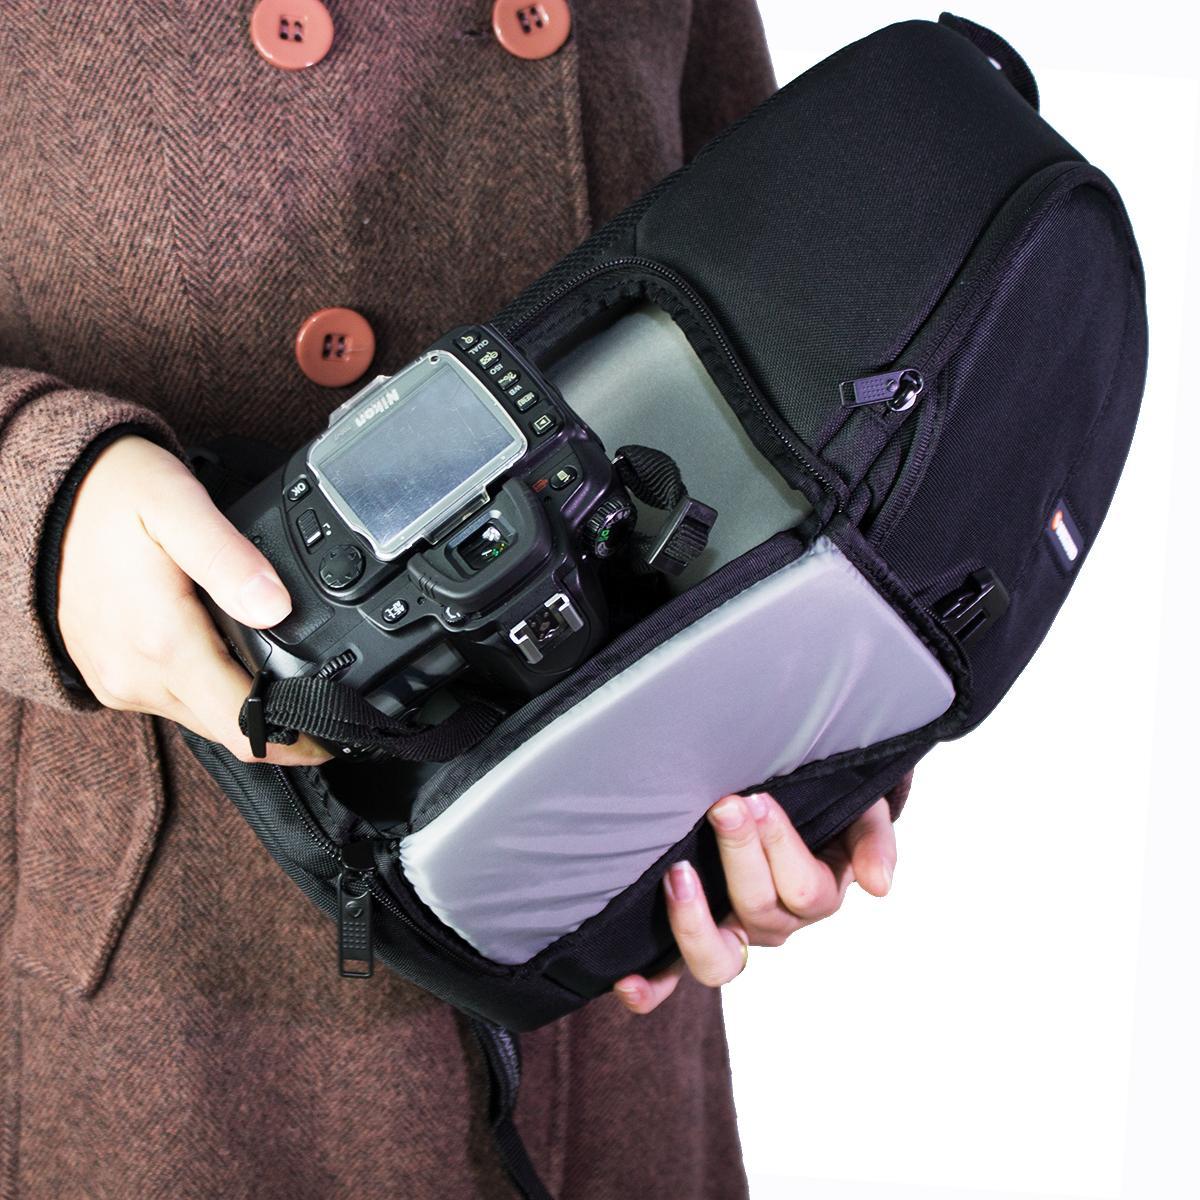 Mochila Vanguard Ziin 47 para Equipamentos Fotográficos  - Fotolux